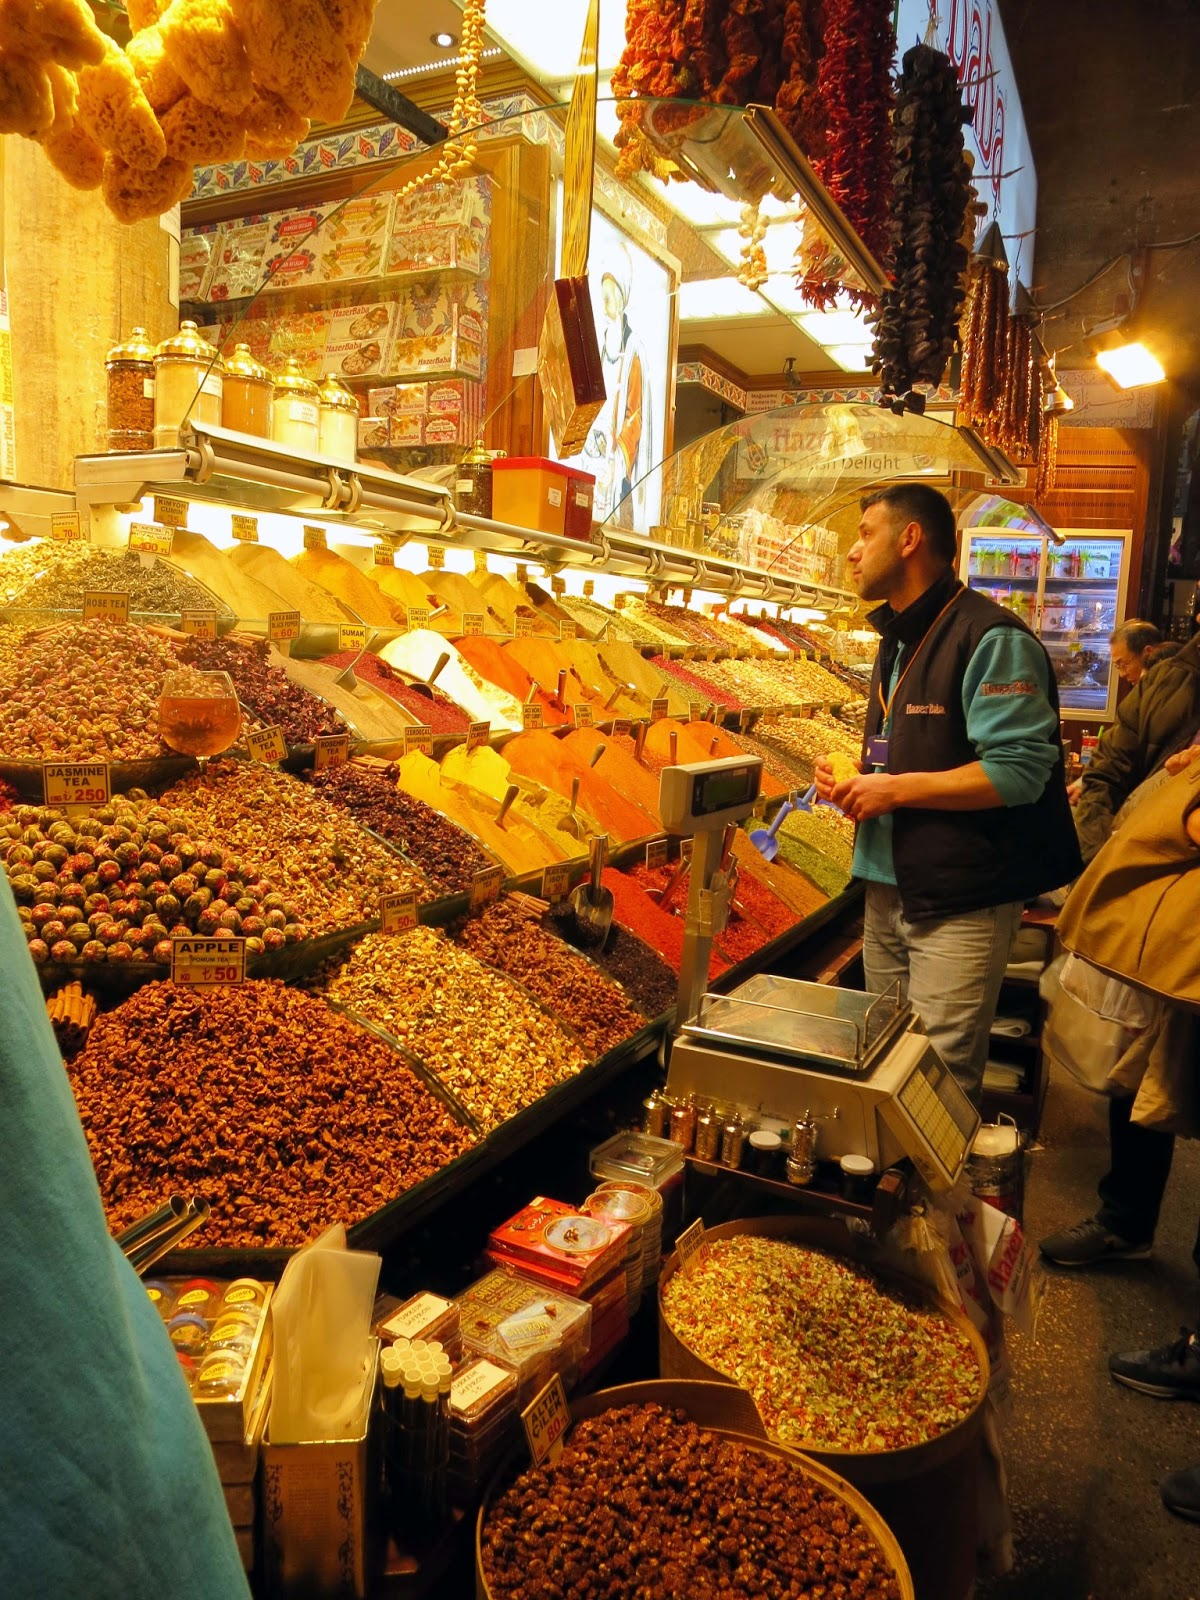 serenechoo.com: Spice Bazaar - Istanbul, Turkey